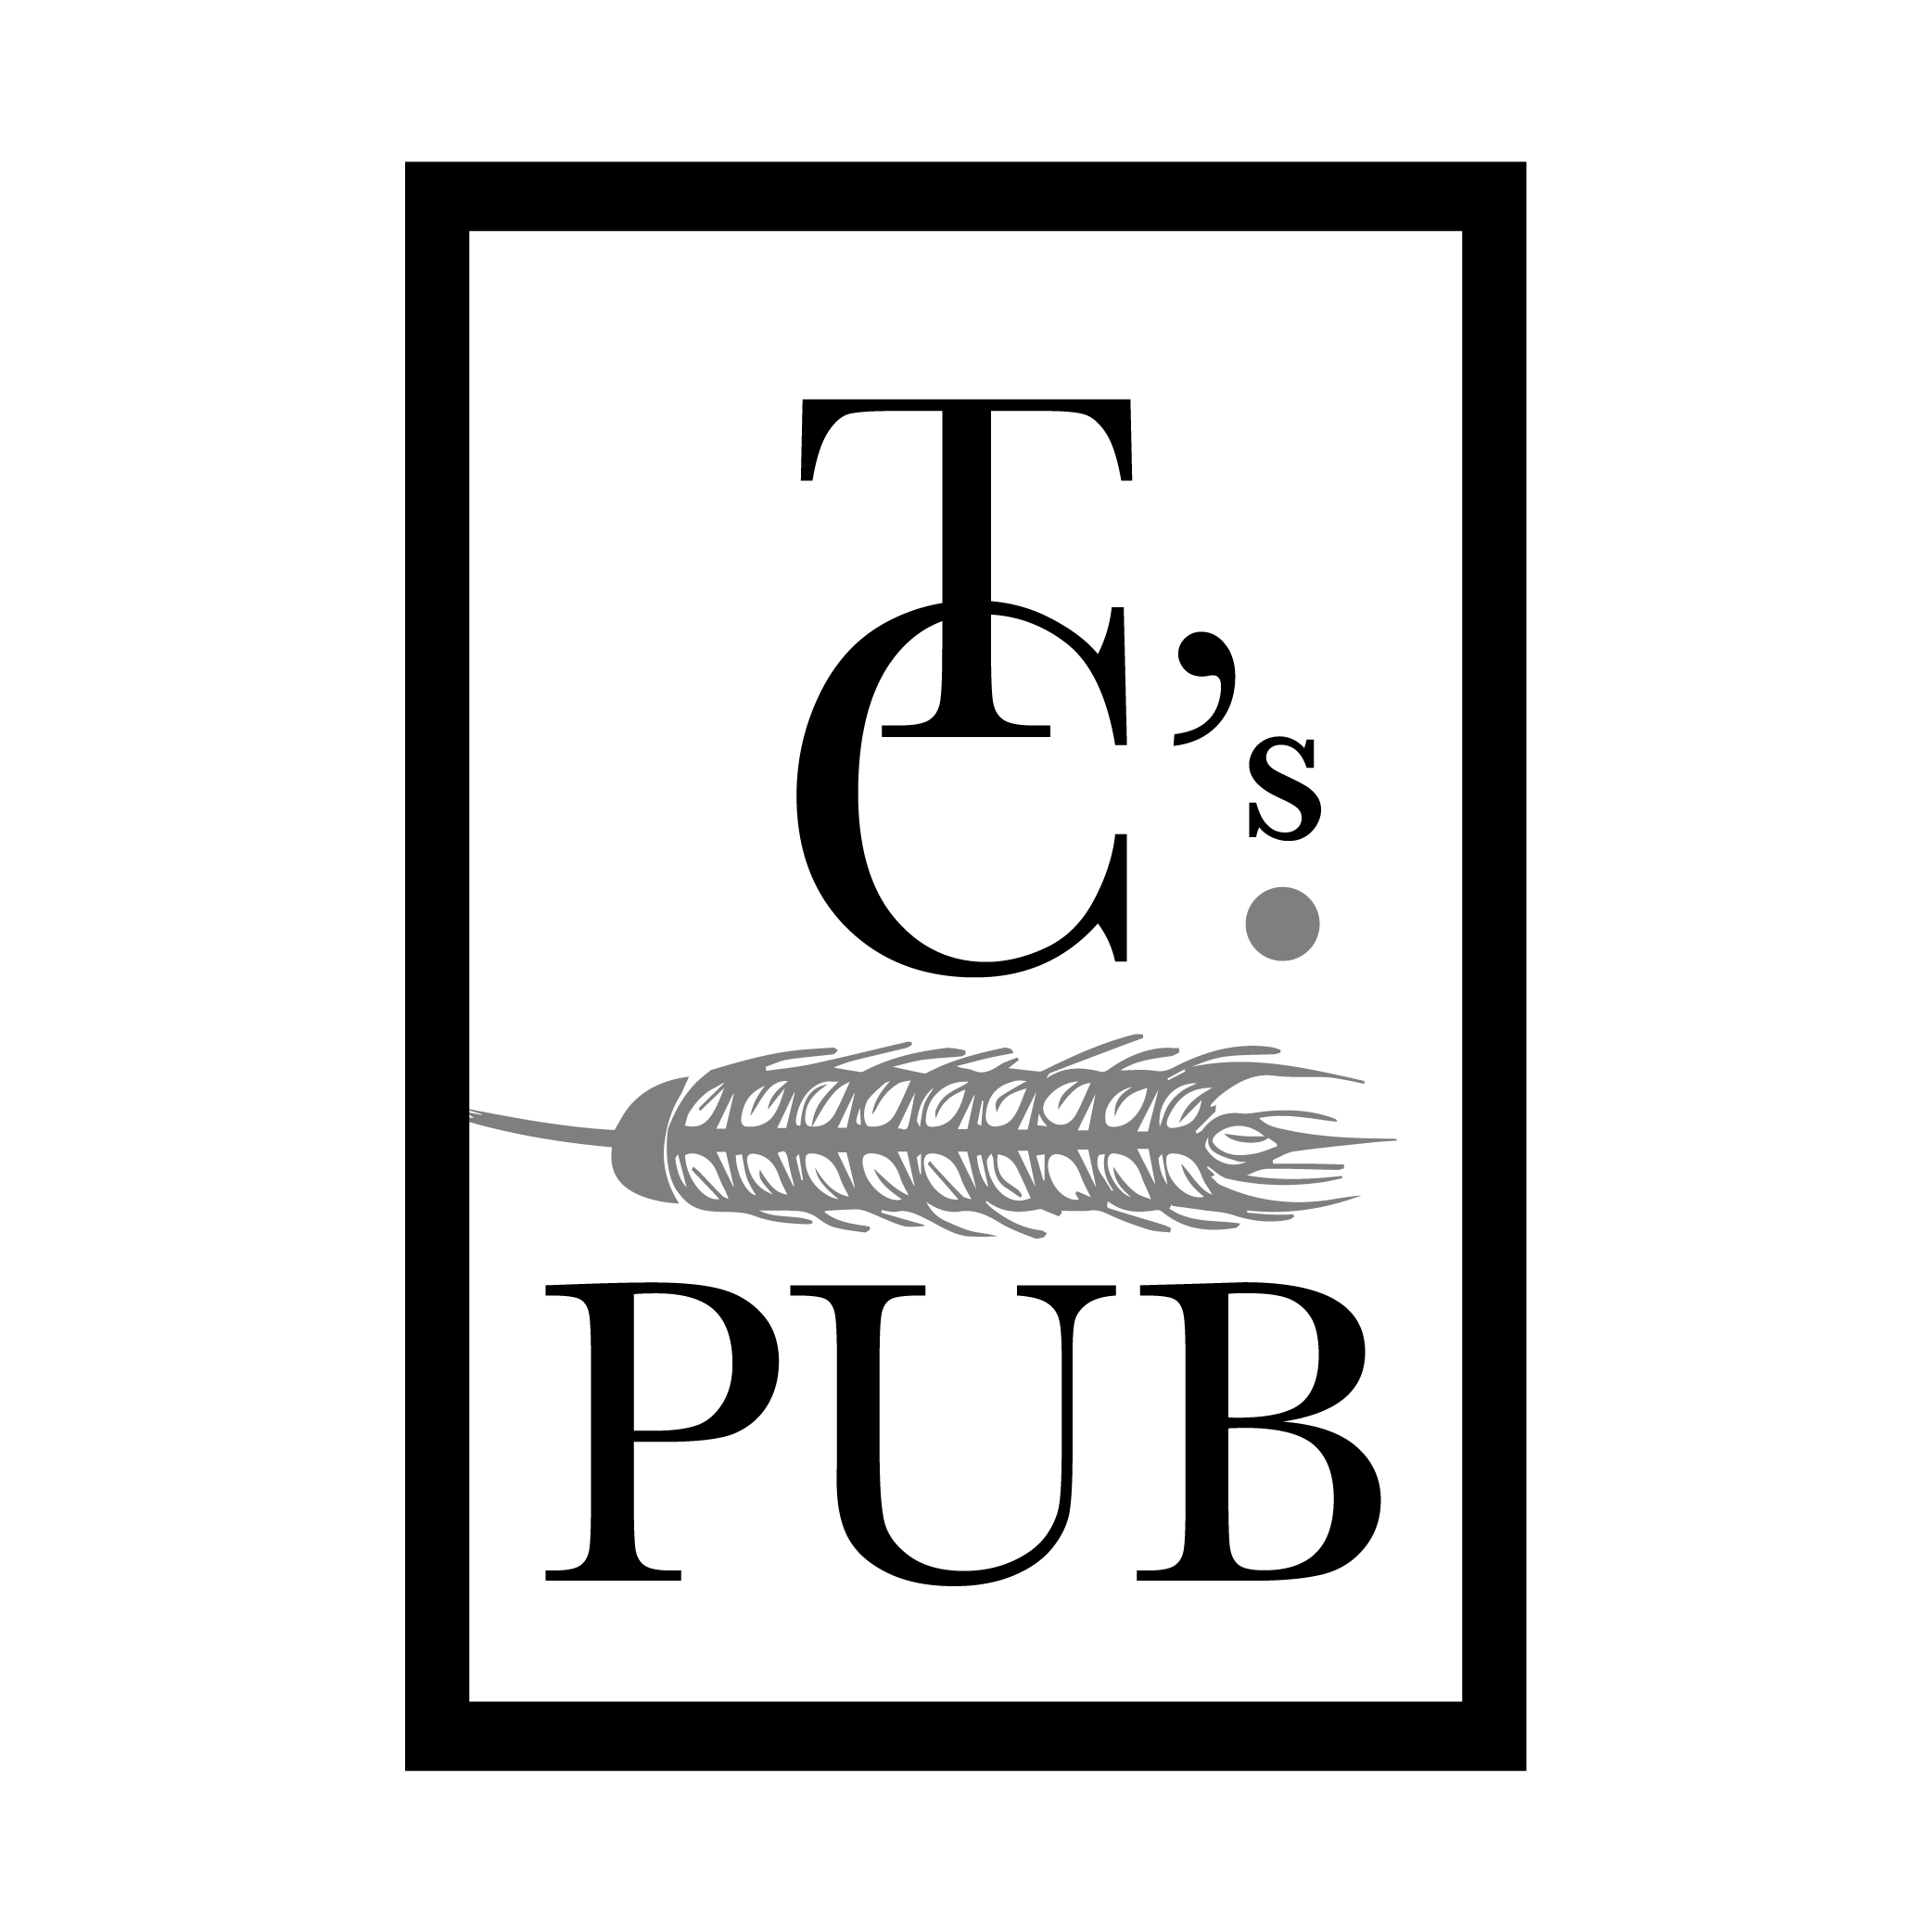 TC's Pub